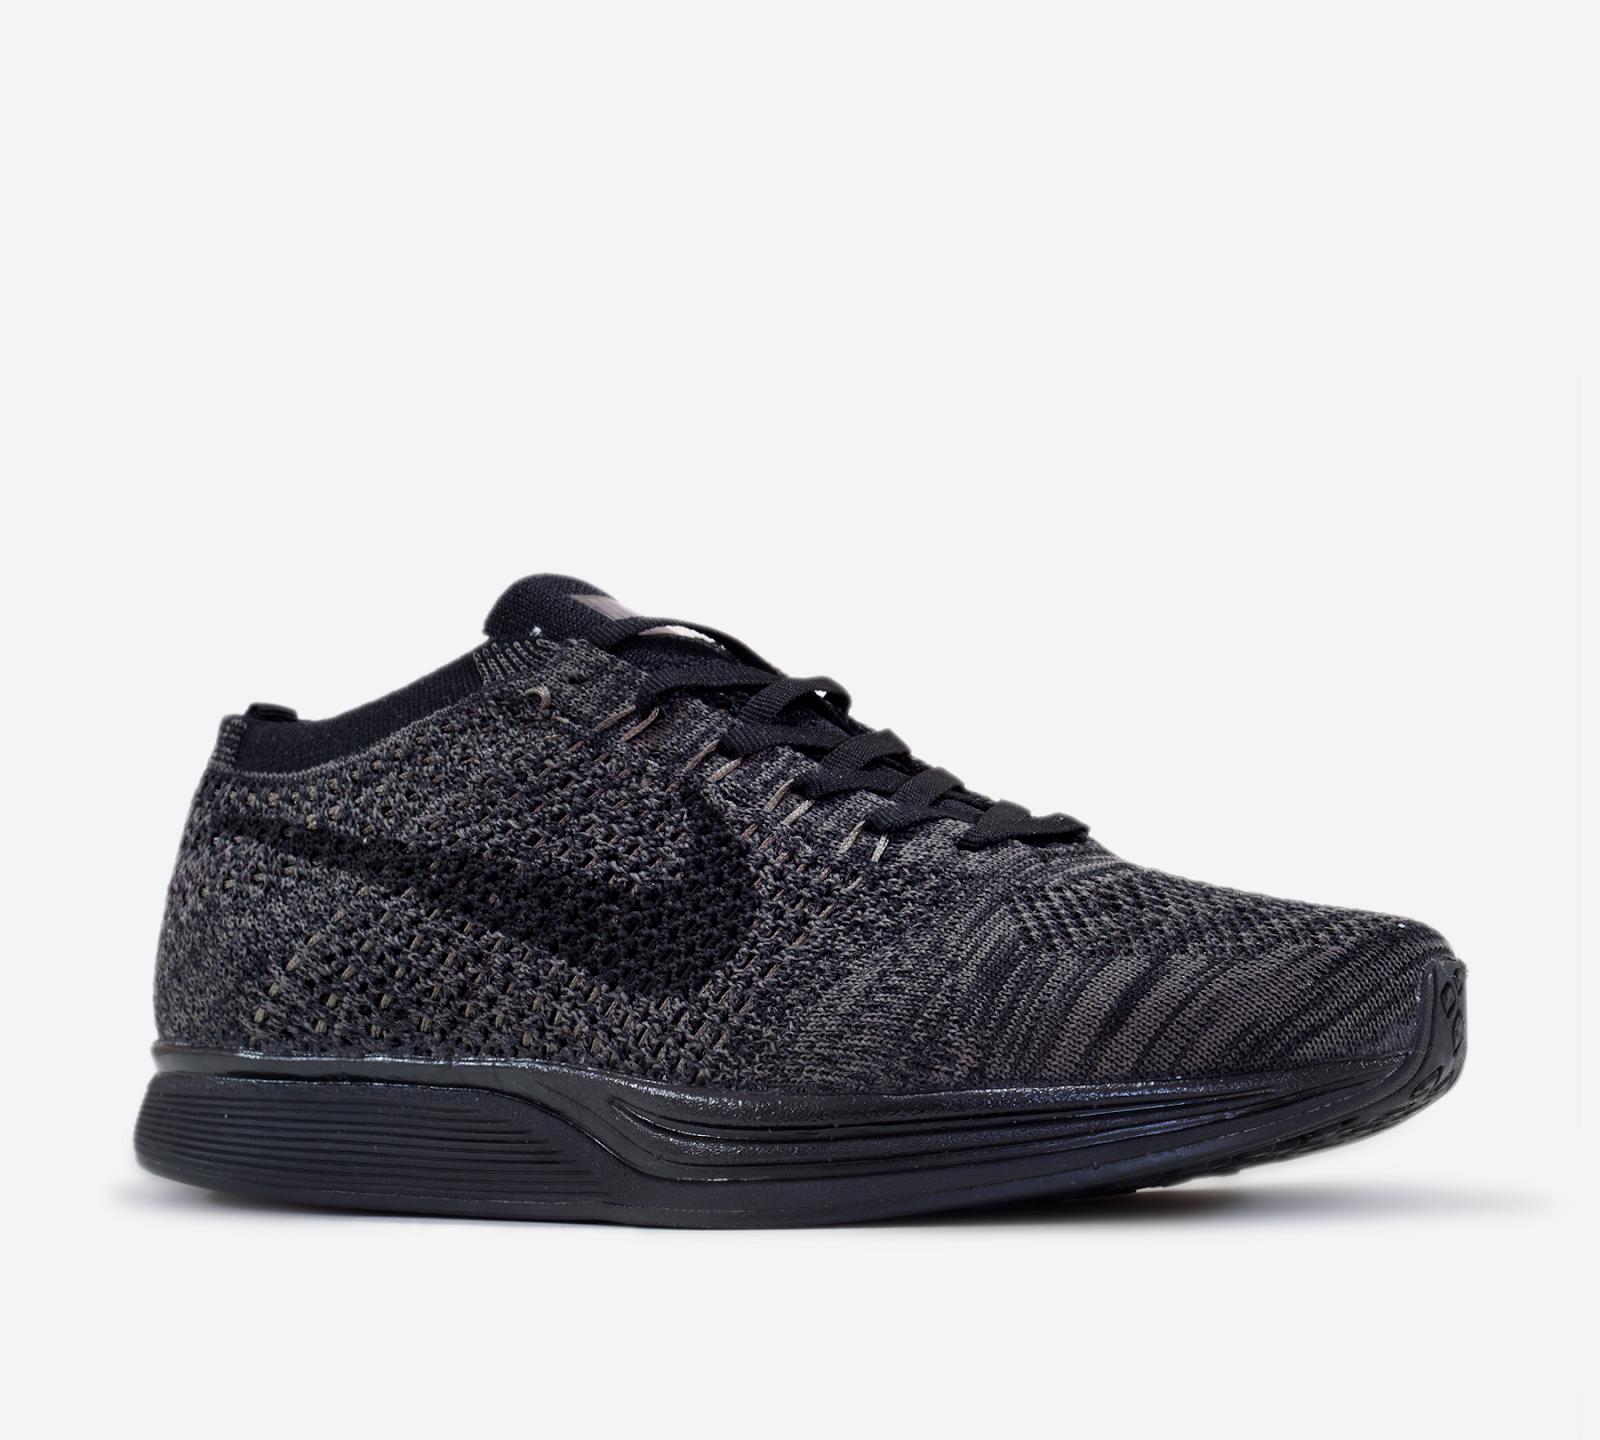 Nike flyknit racer phối màu black